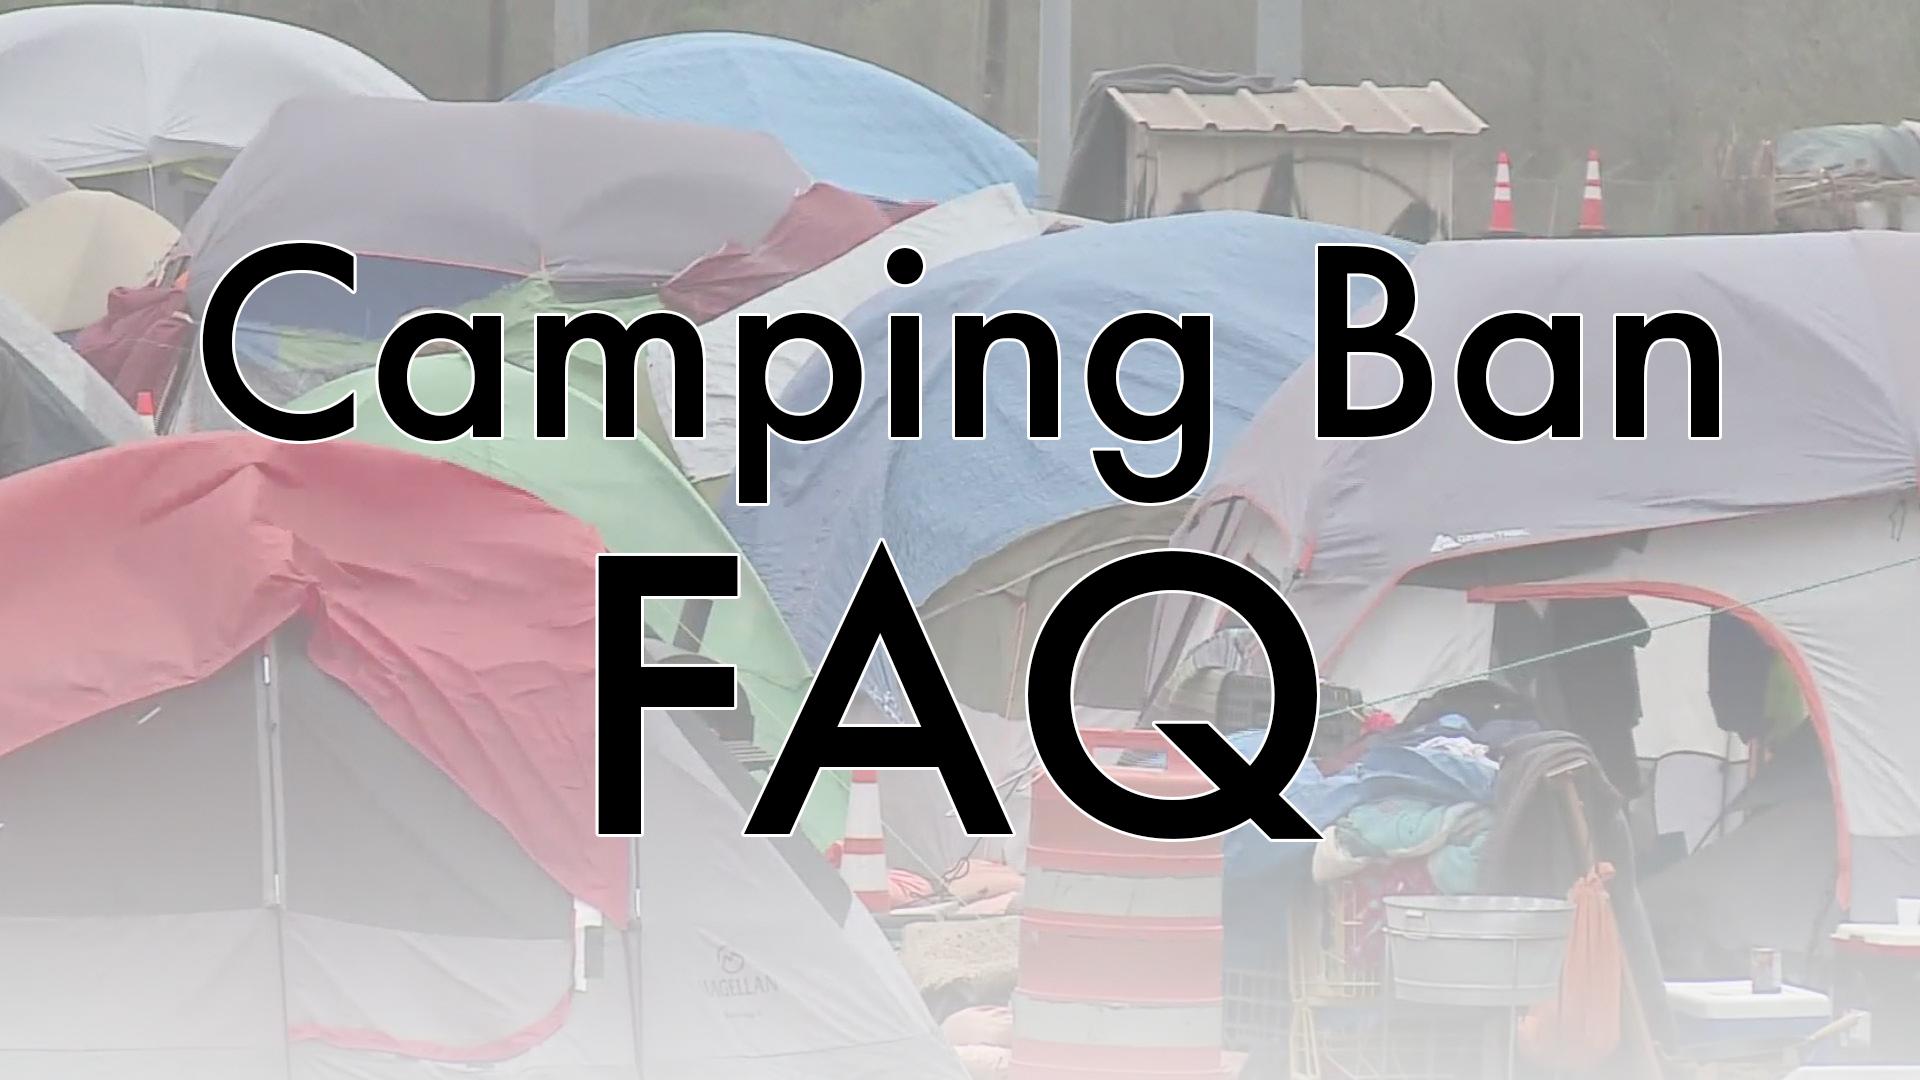 Austin camping ban FAQ